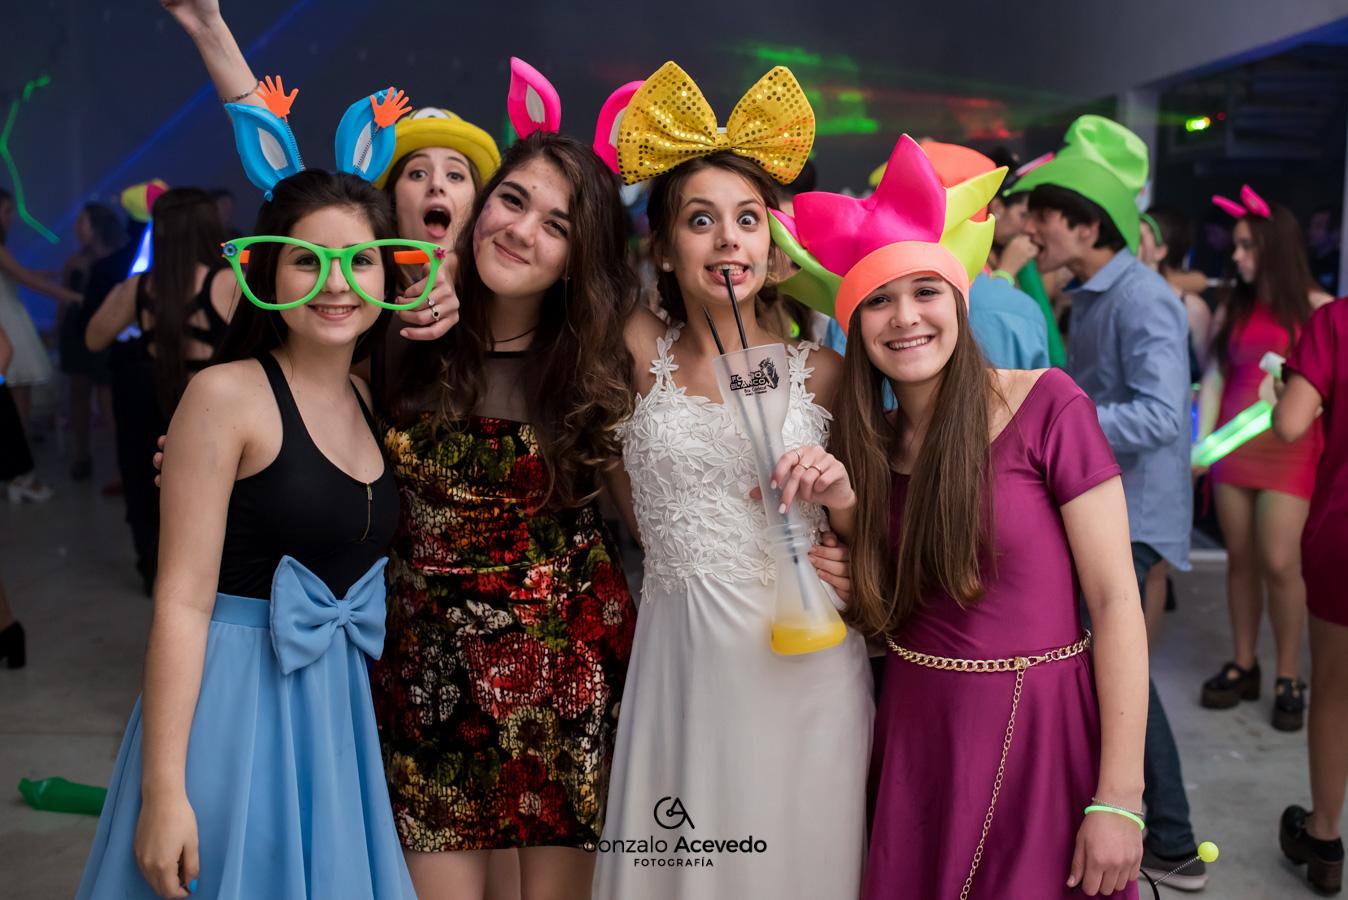 Fiesta evento Lorena Nobile colon entre rios Gonzalo Acevedo Fotografia